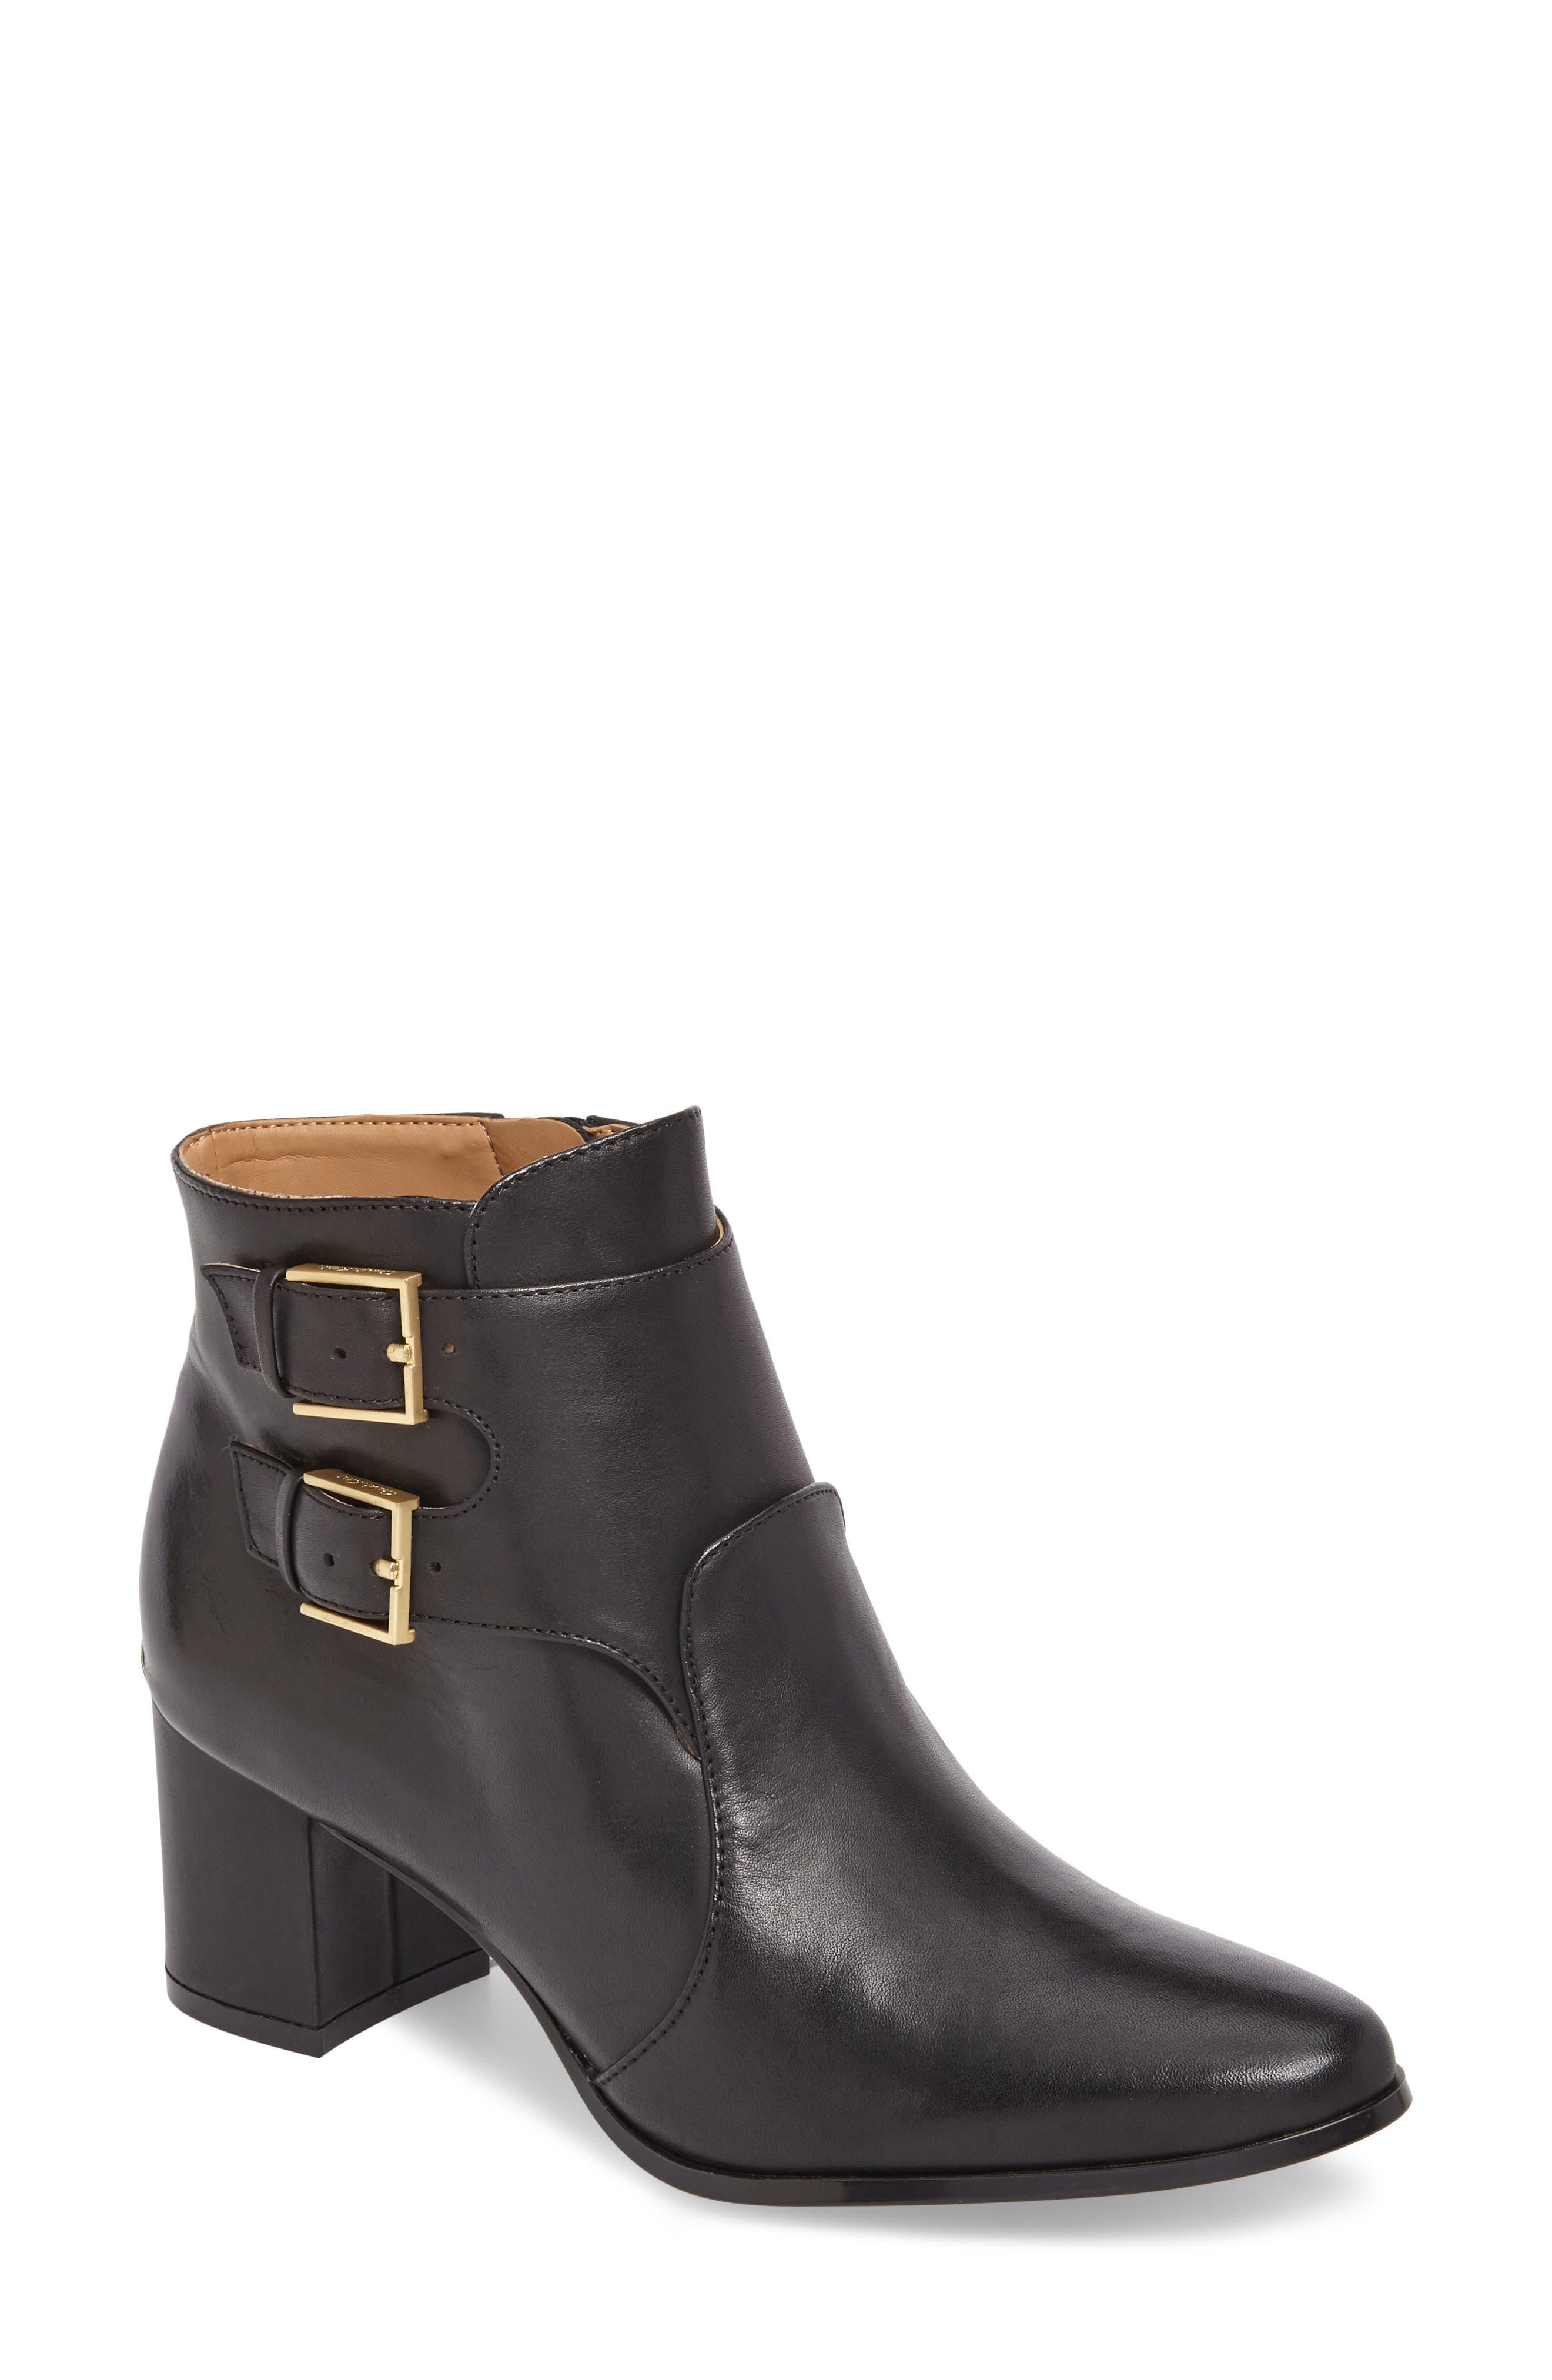 Florine Bootie,                         Main,                         color, Black Leather